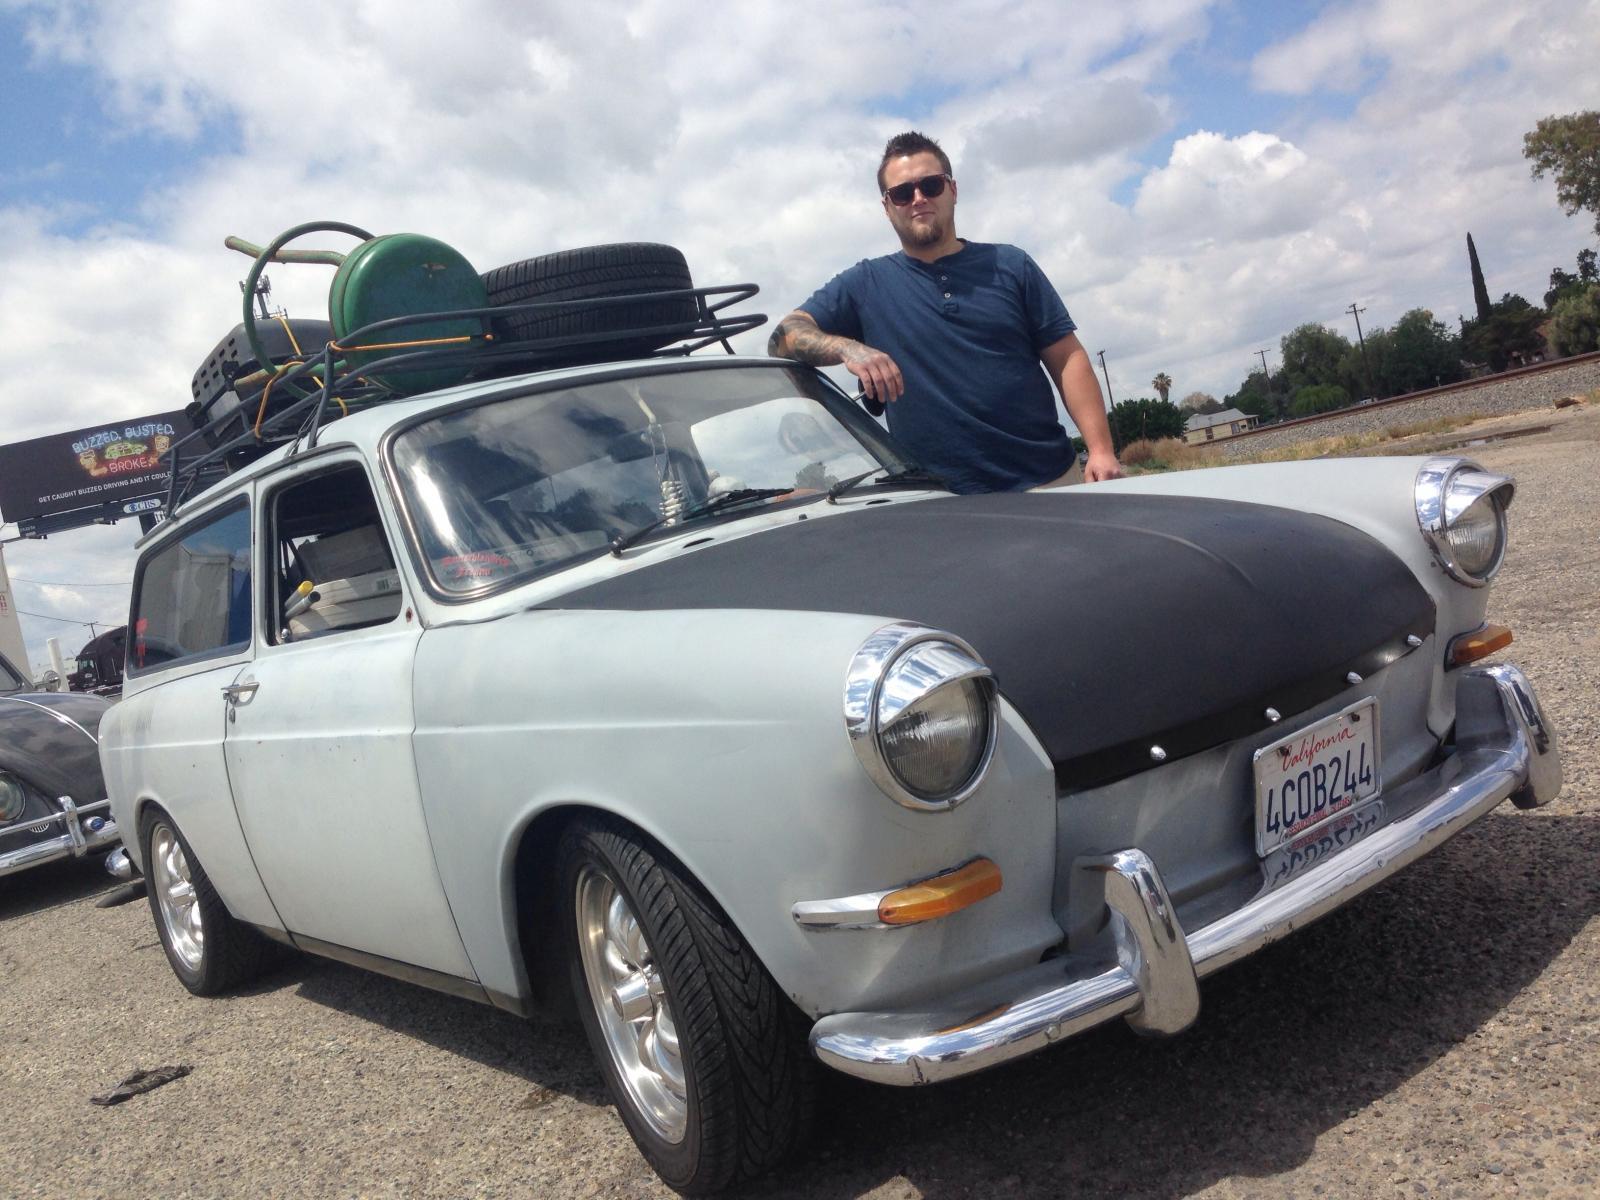 Deutschlanders Fresno VW Club.